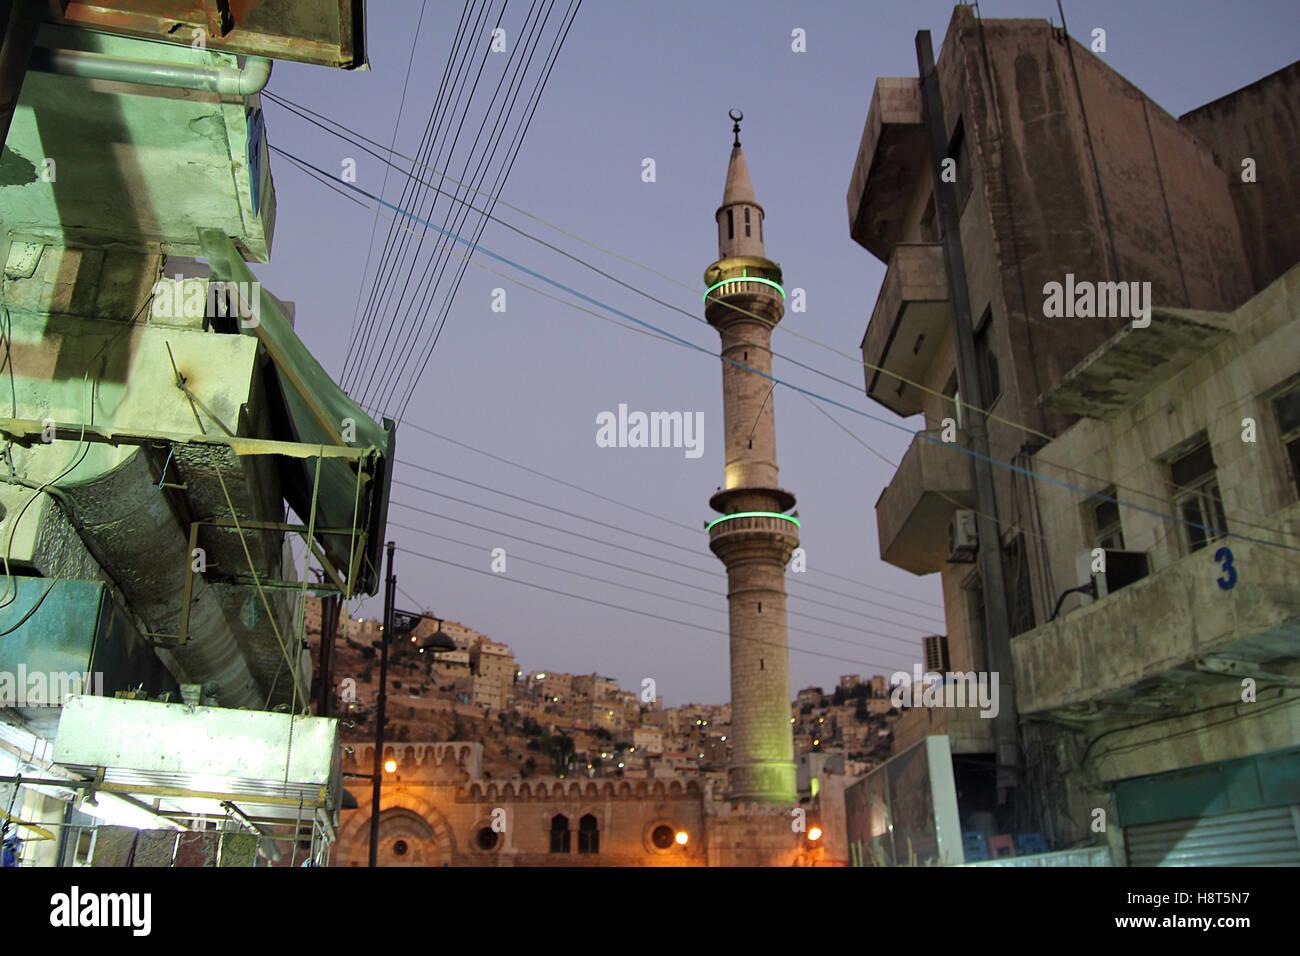 Capitol di GIORDANIA - Amman. Immagini Stock